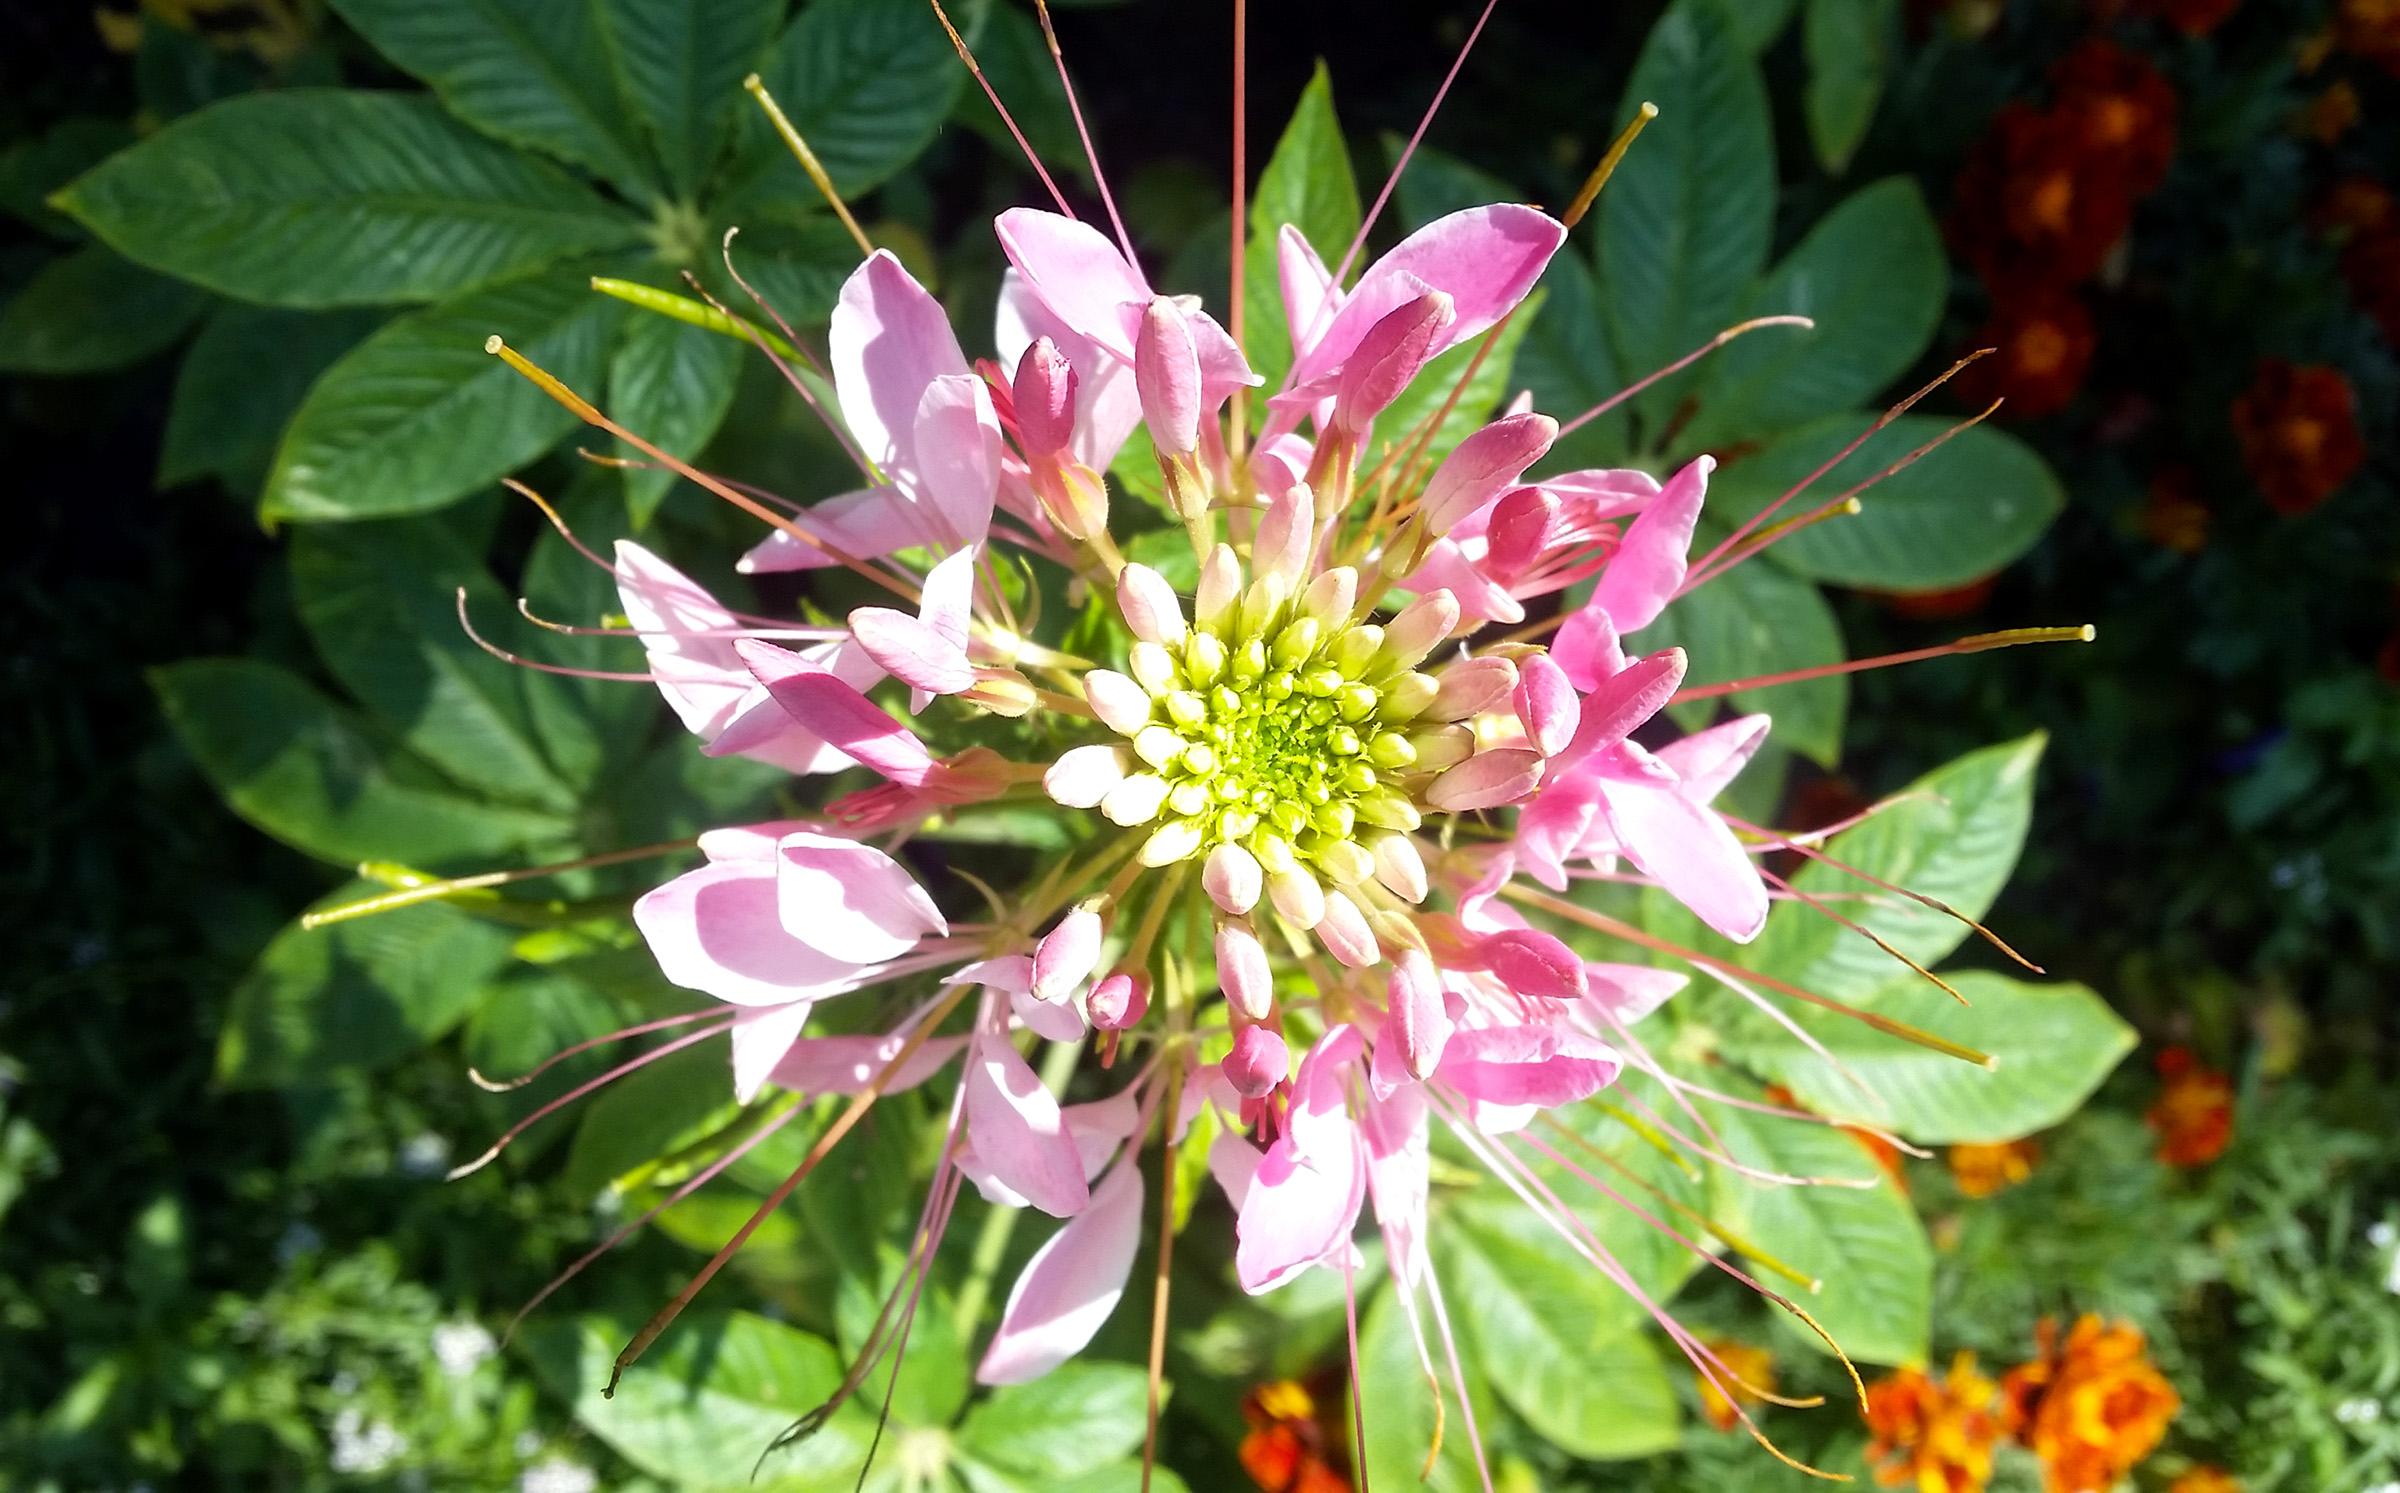 Gėlė kleomė